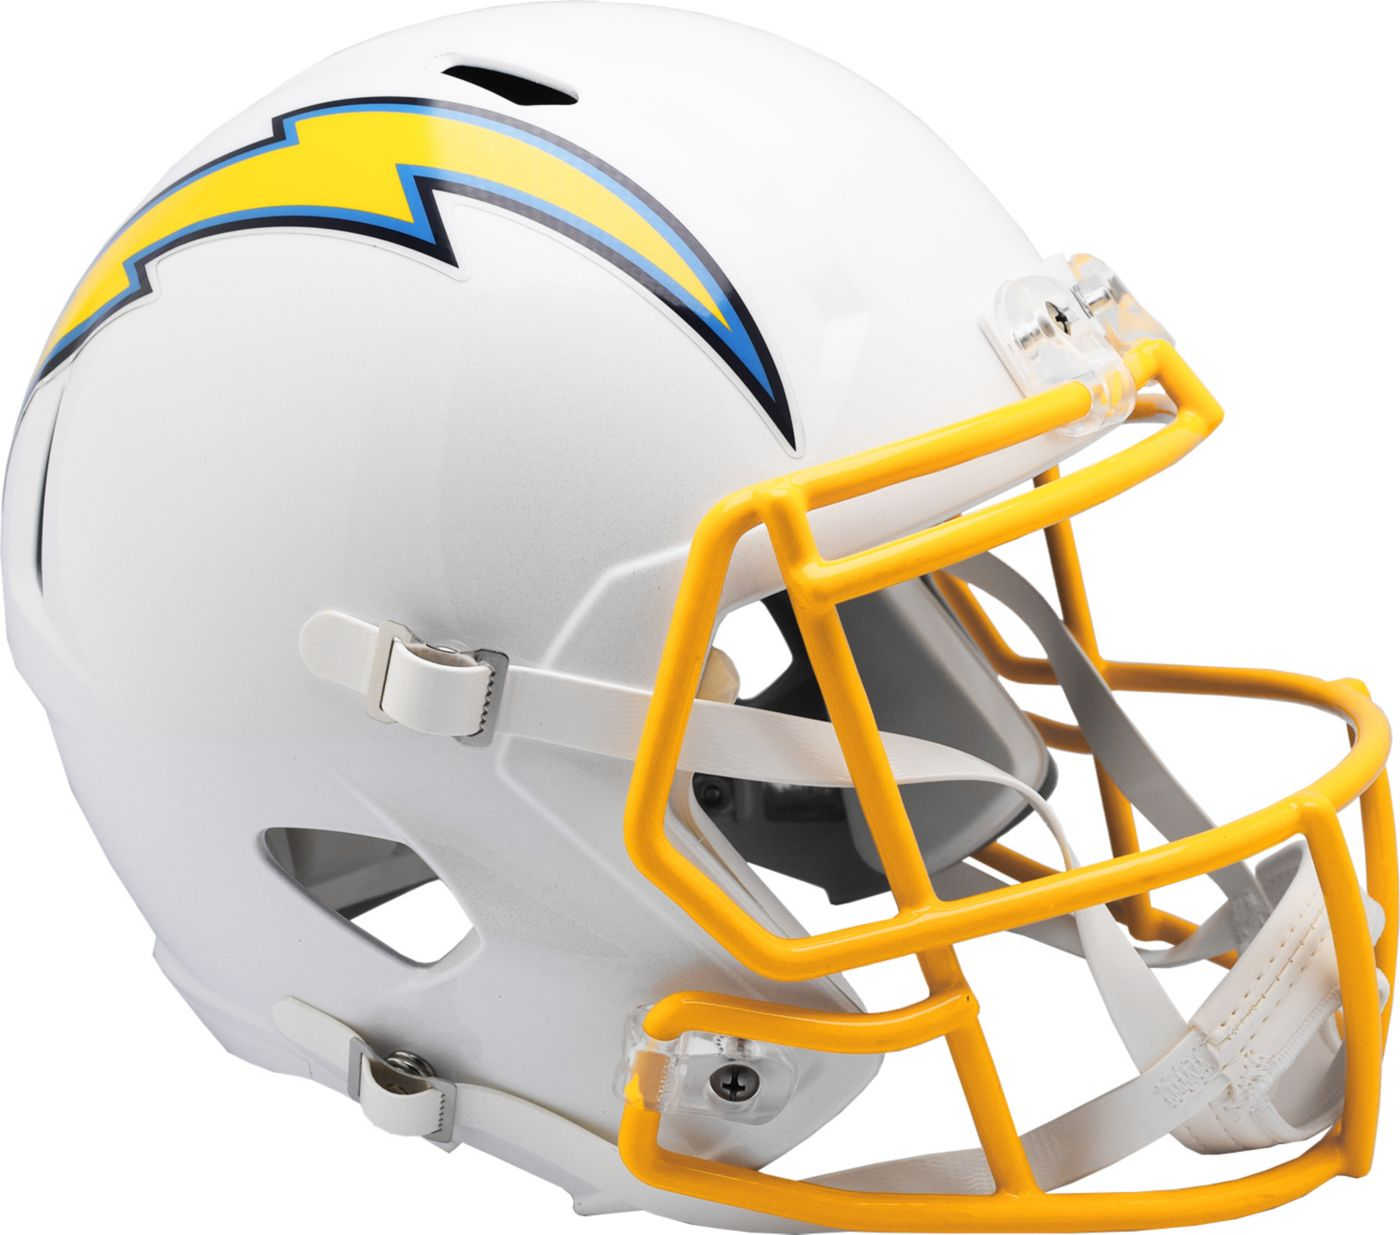 Riddell Los Angeles Chargers Speed Replica Football Helmet